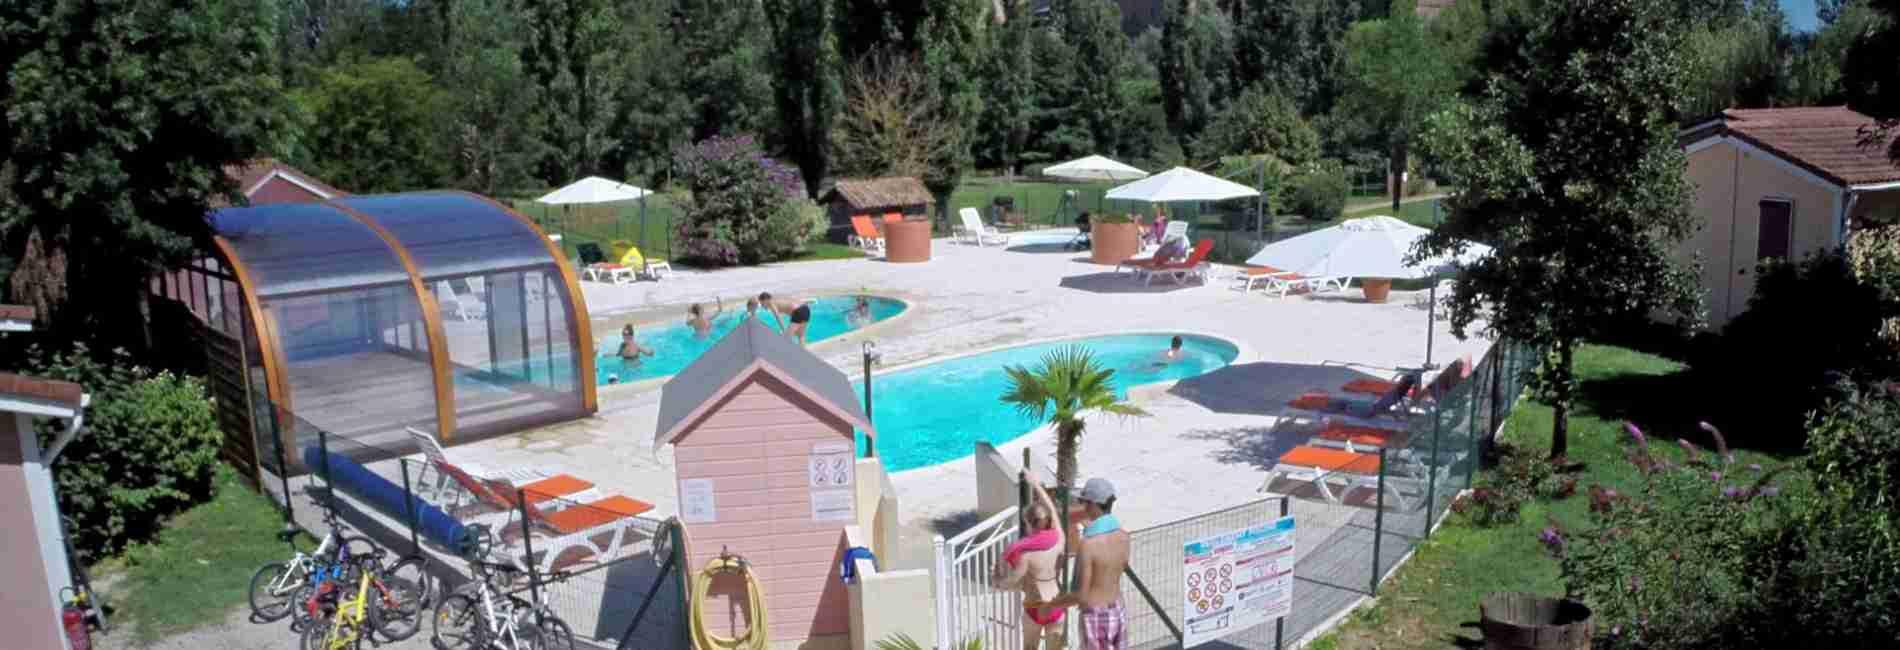 piscine-couverte-chauffée-gîtes.jpg